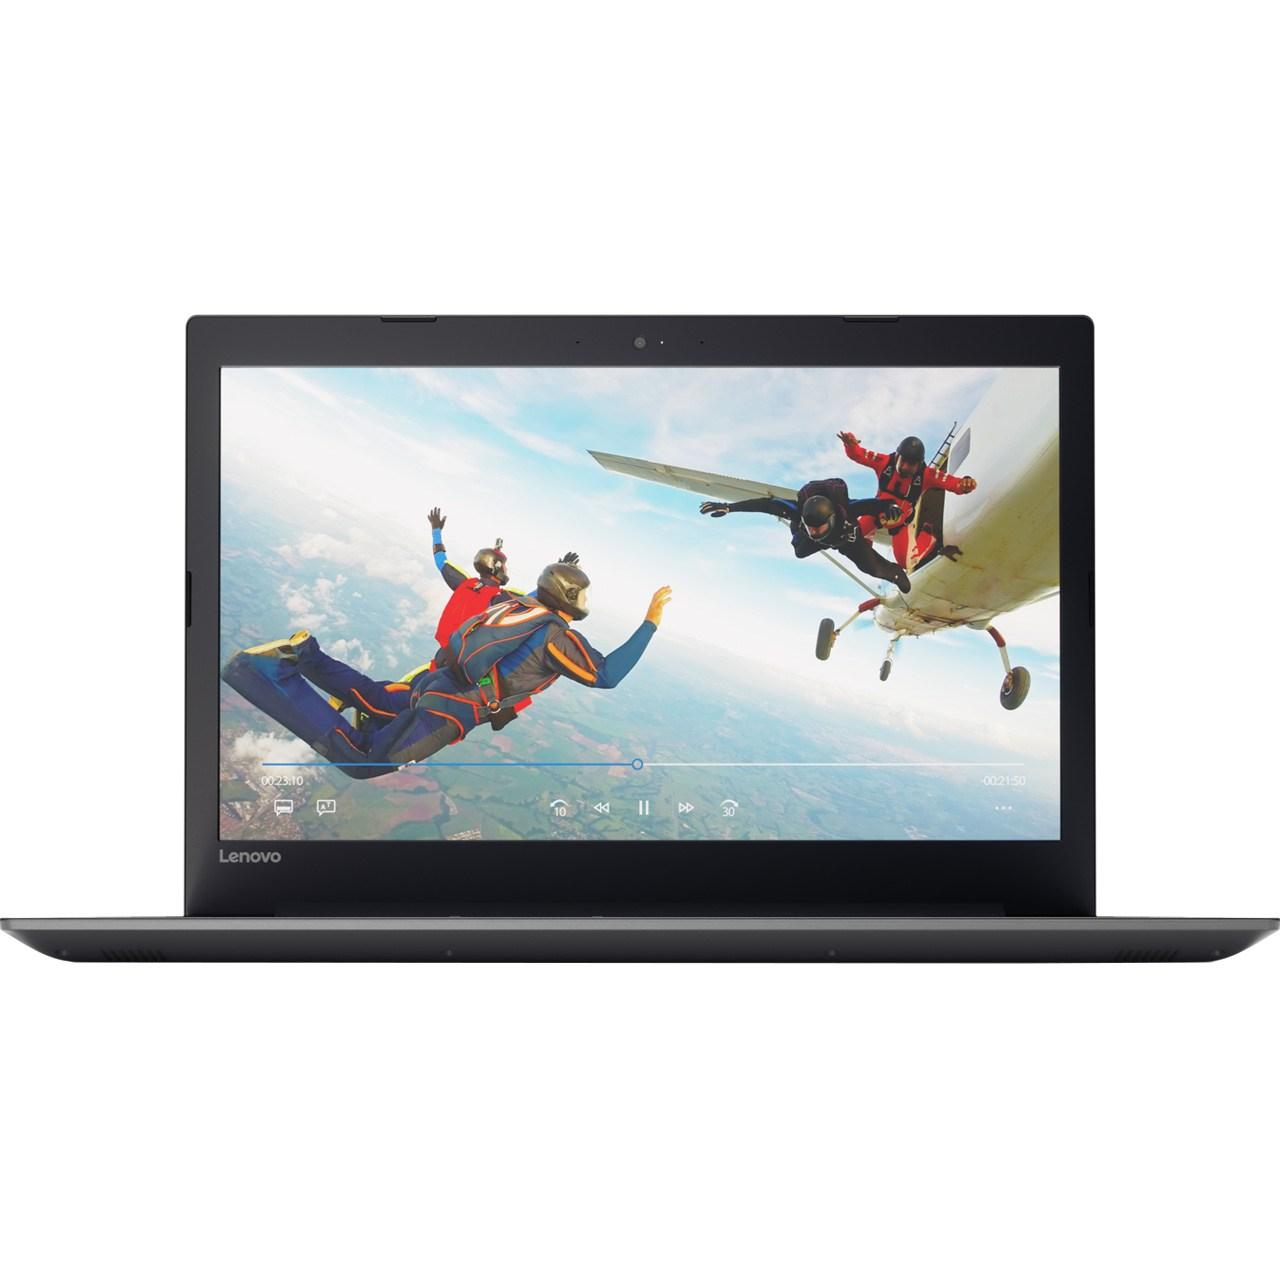 قیمت لپ تاپ 15 اینچی لنوو مدل Ideapad 320 - H